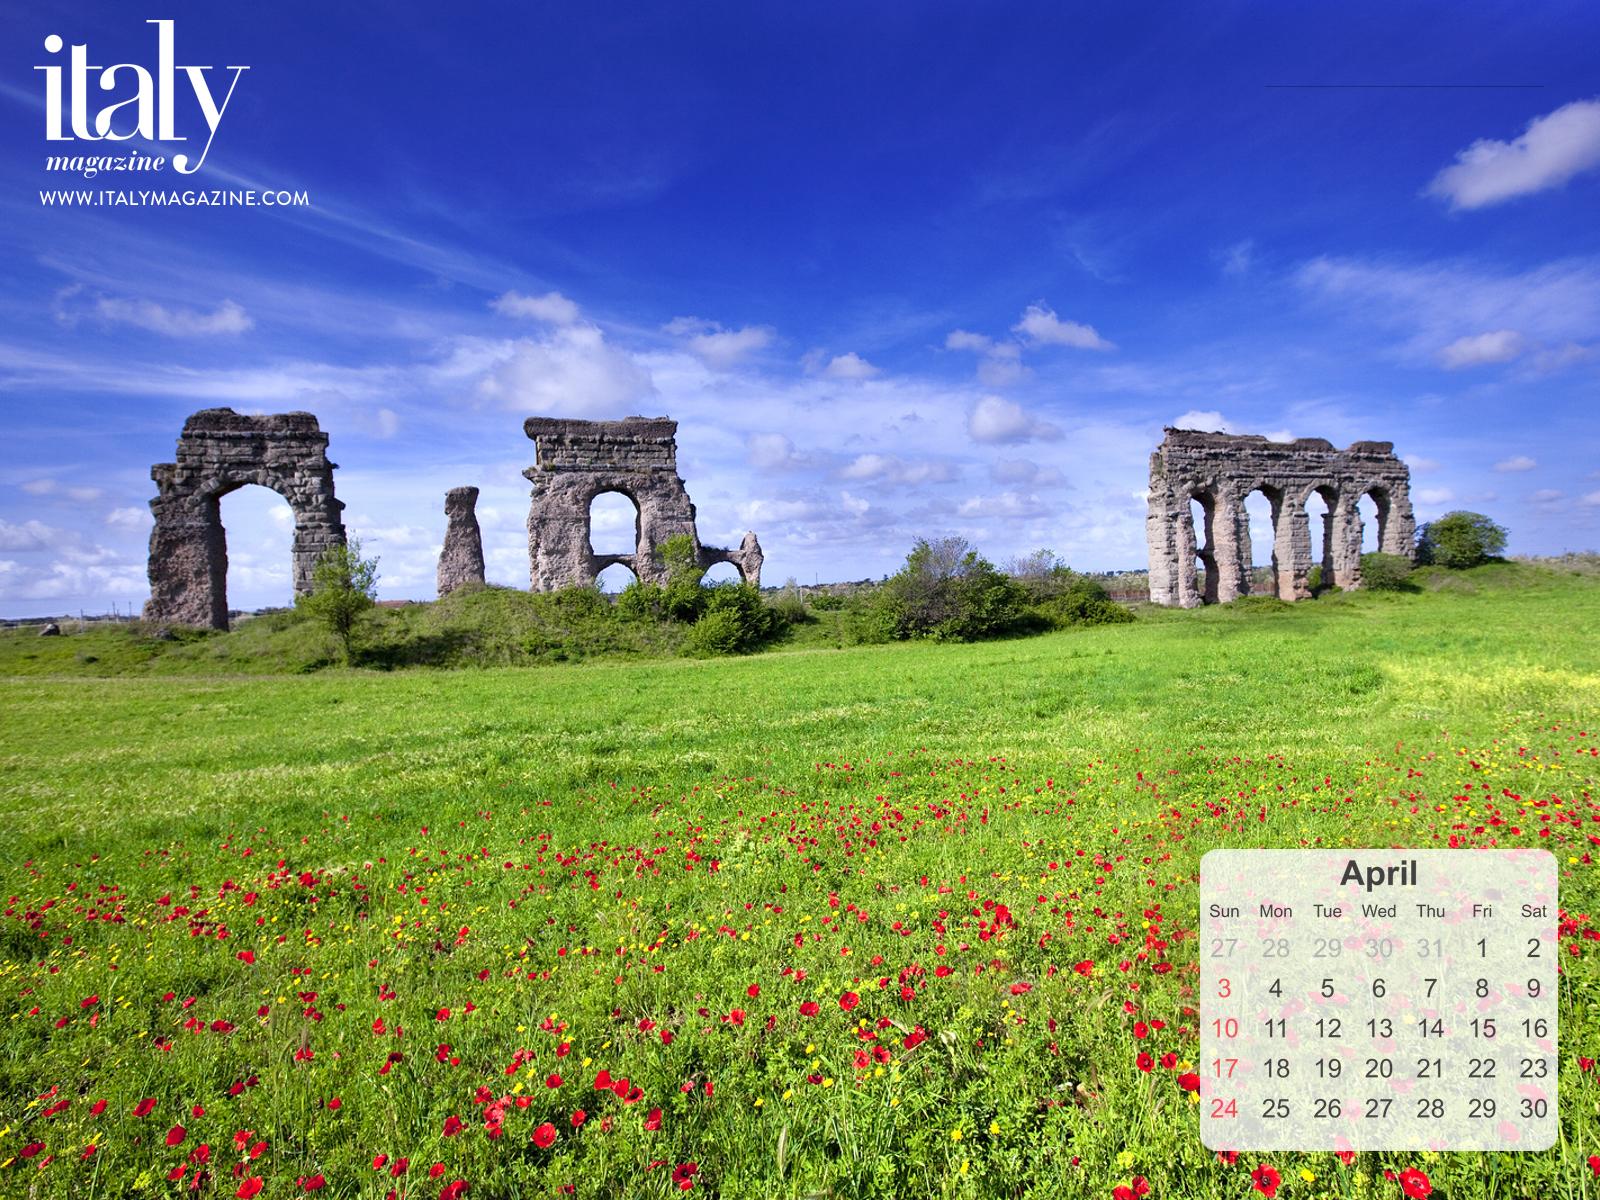 Wallpaper Calendar   April 2016 ITALY Magazine 1600x1200